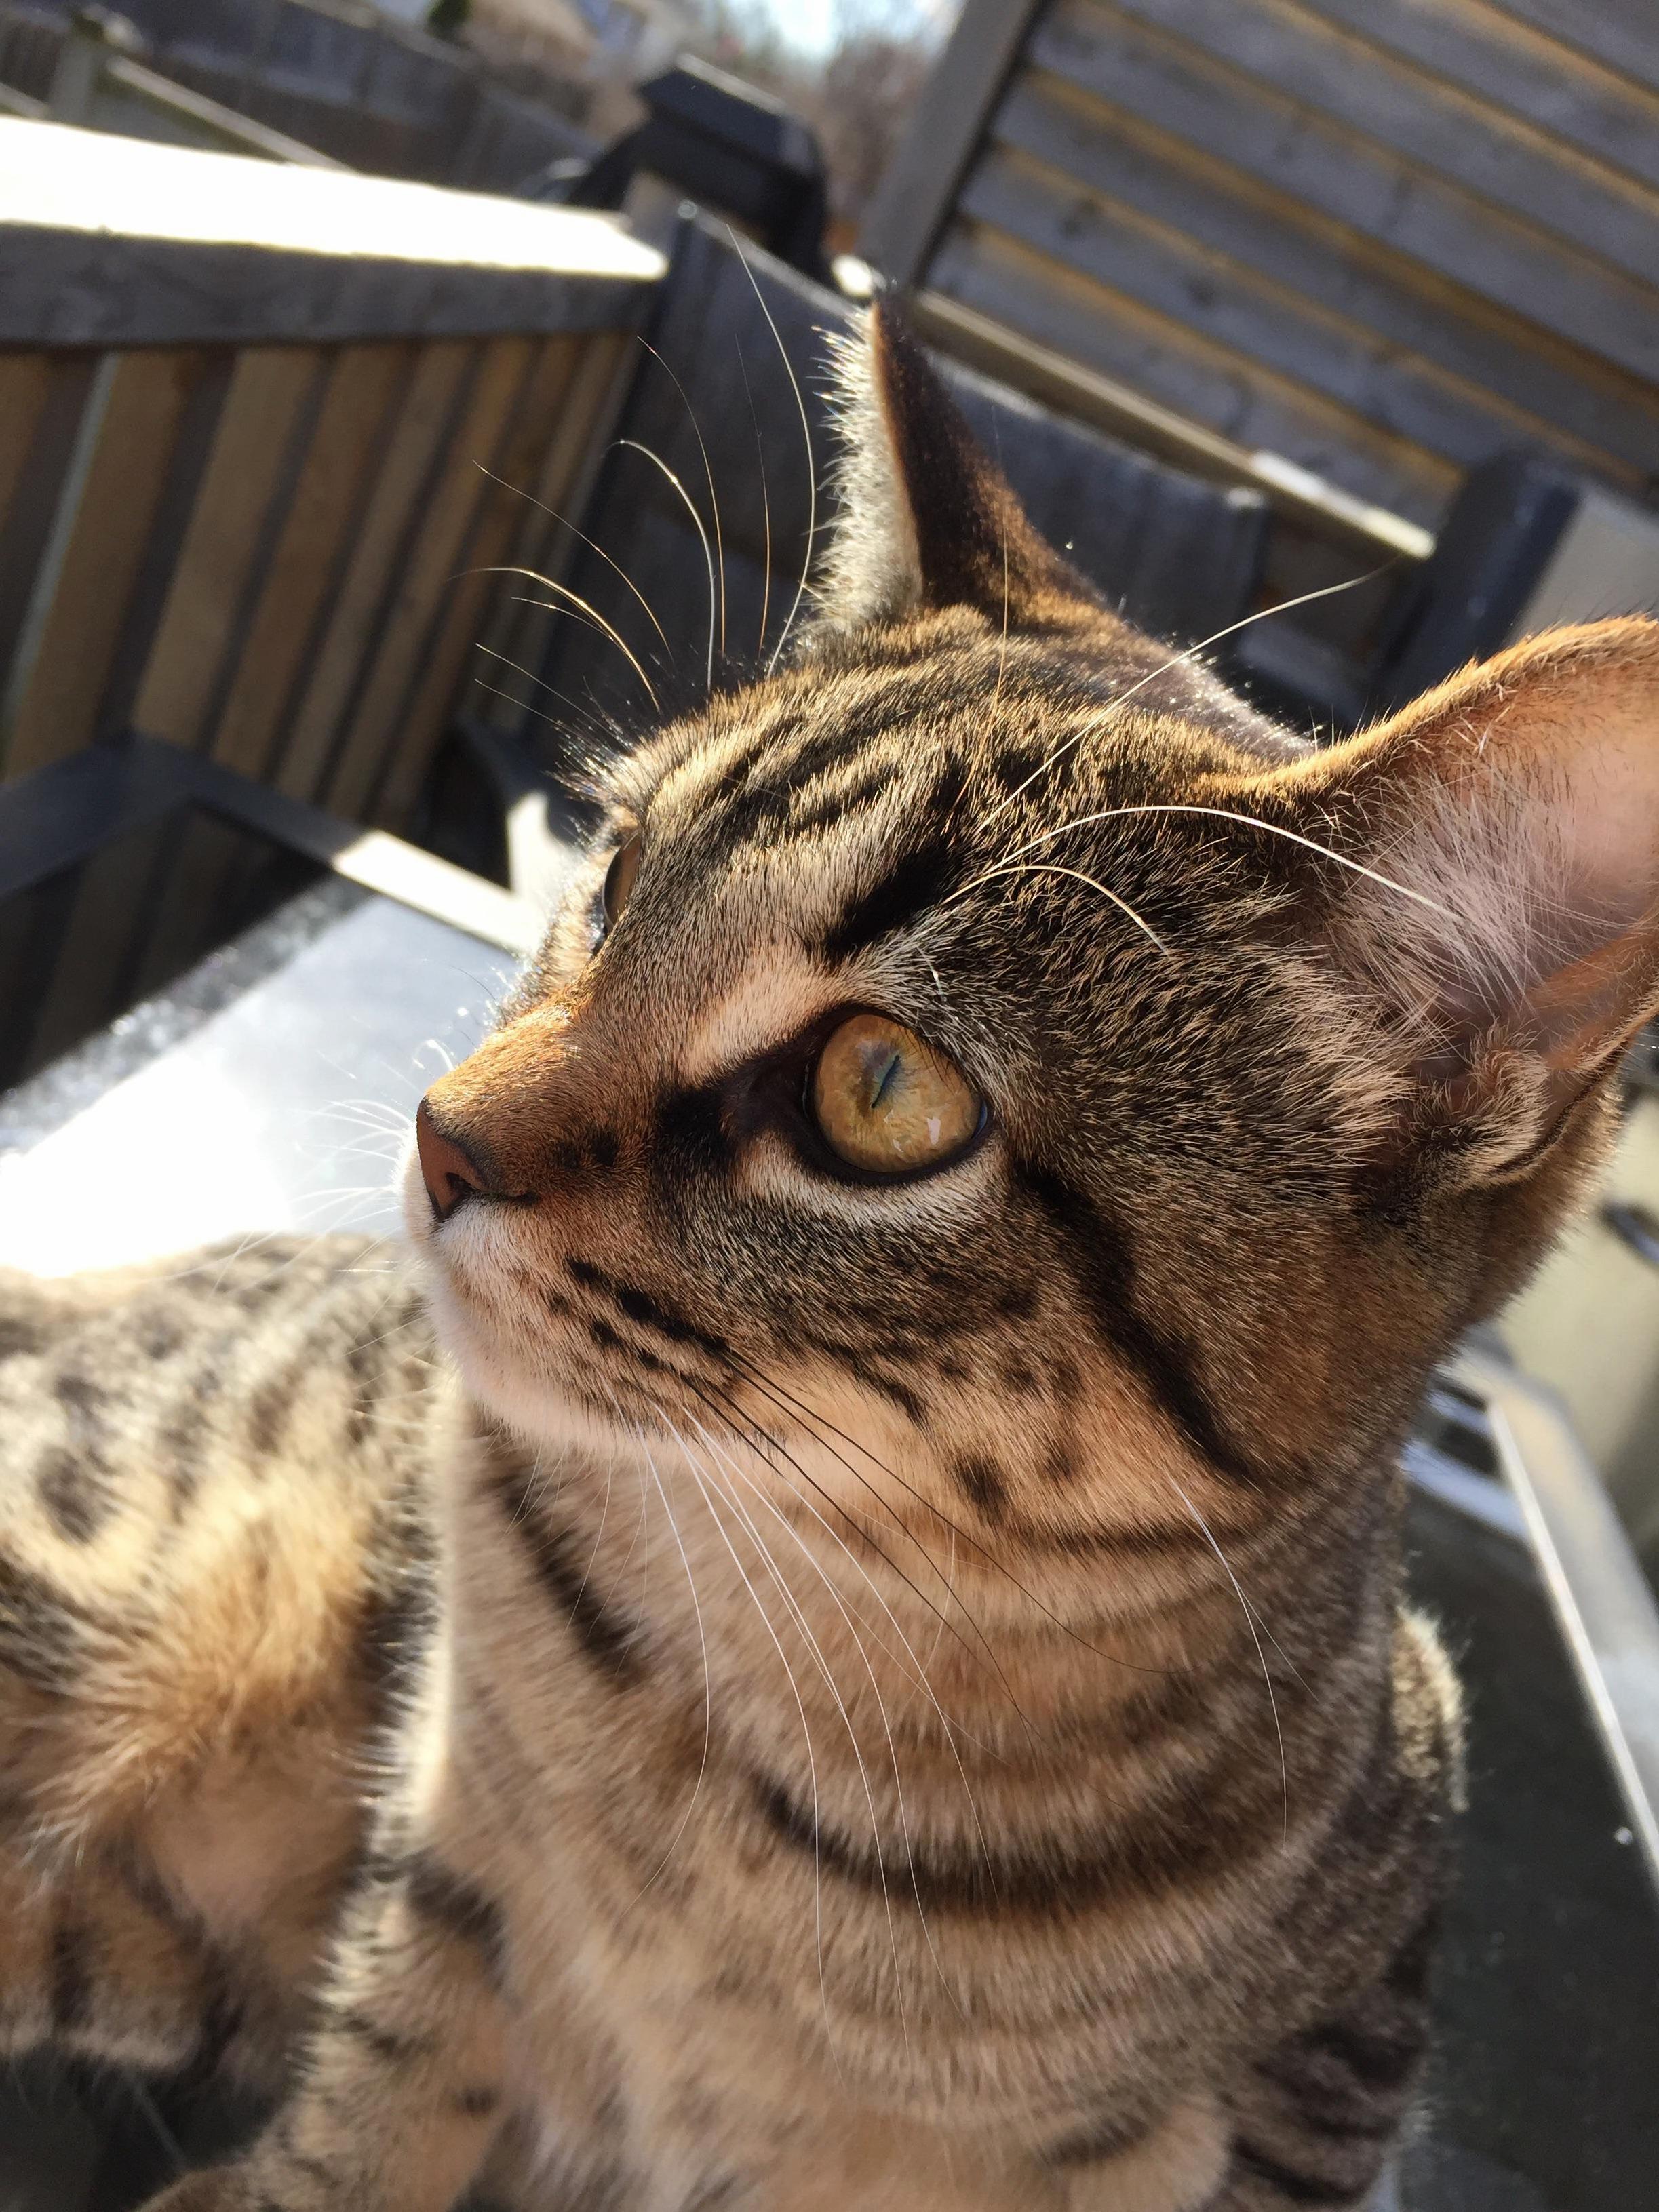 My cat cherry sitting in the sun.